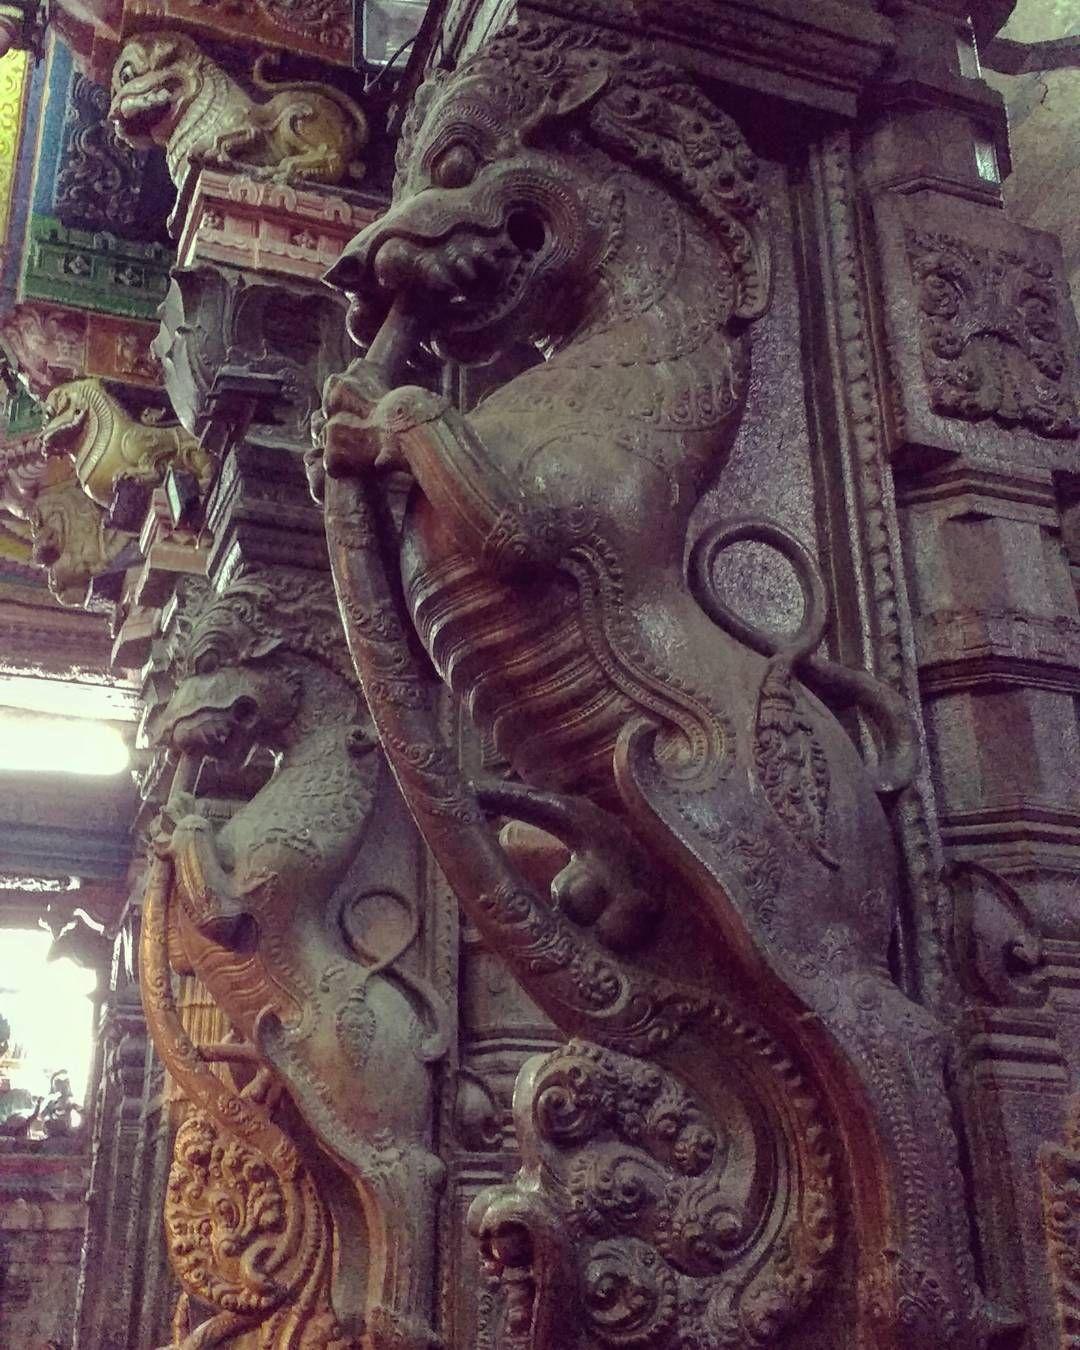 Yaali idol madurai temple india travel architecture